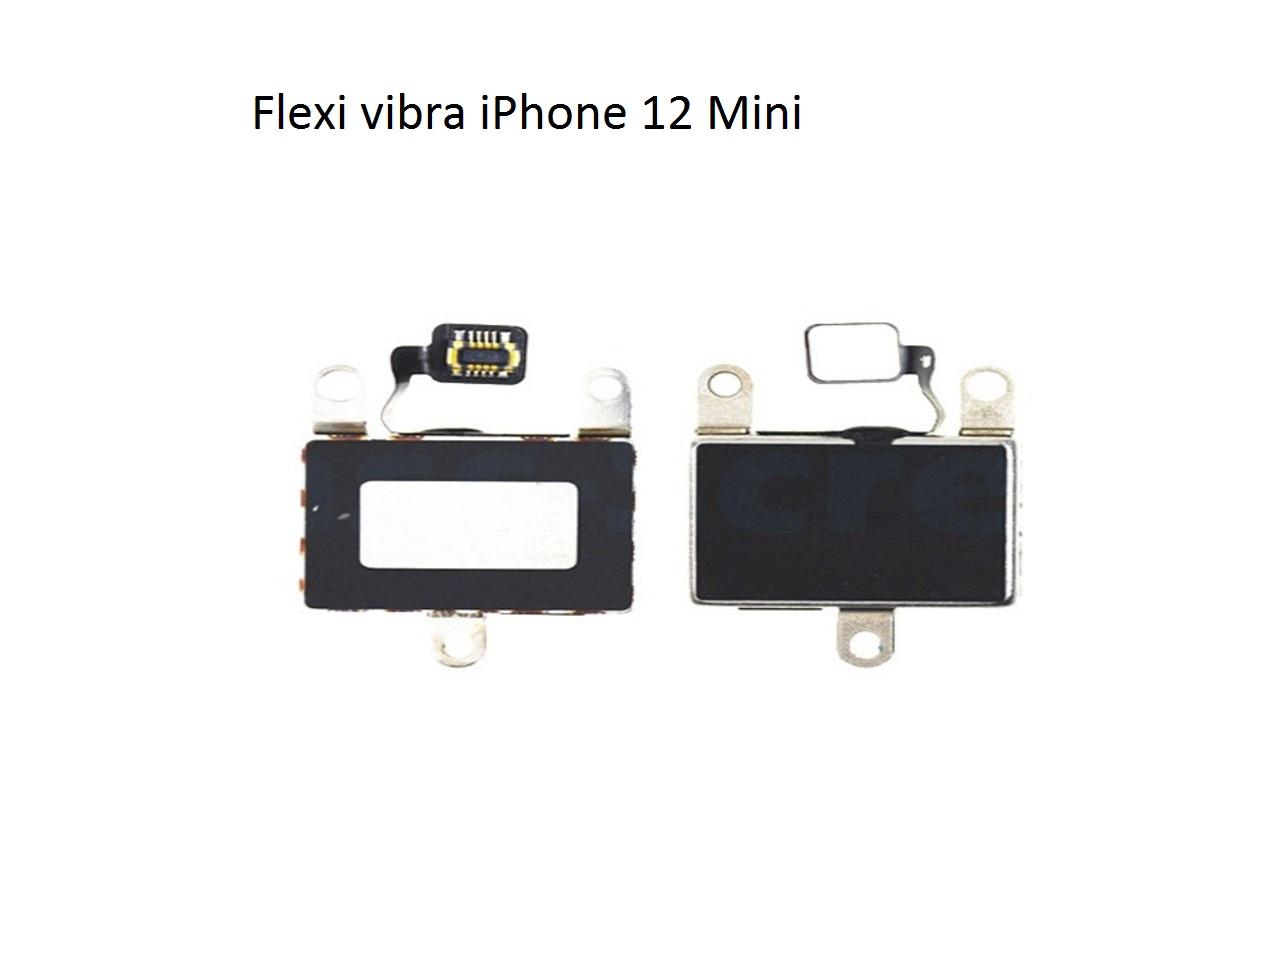 flexi vibra iphone 12 mini